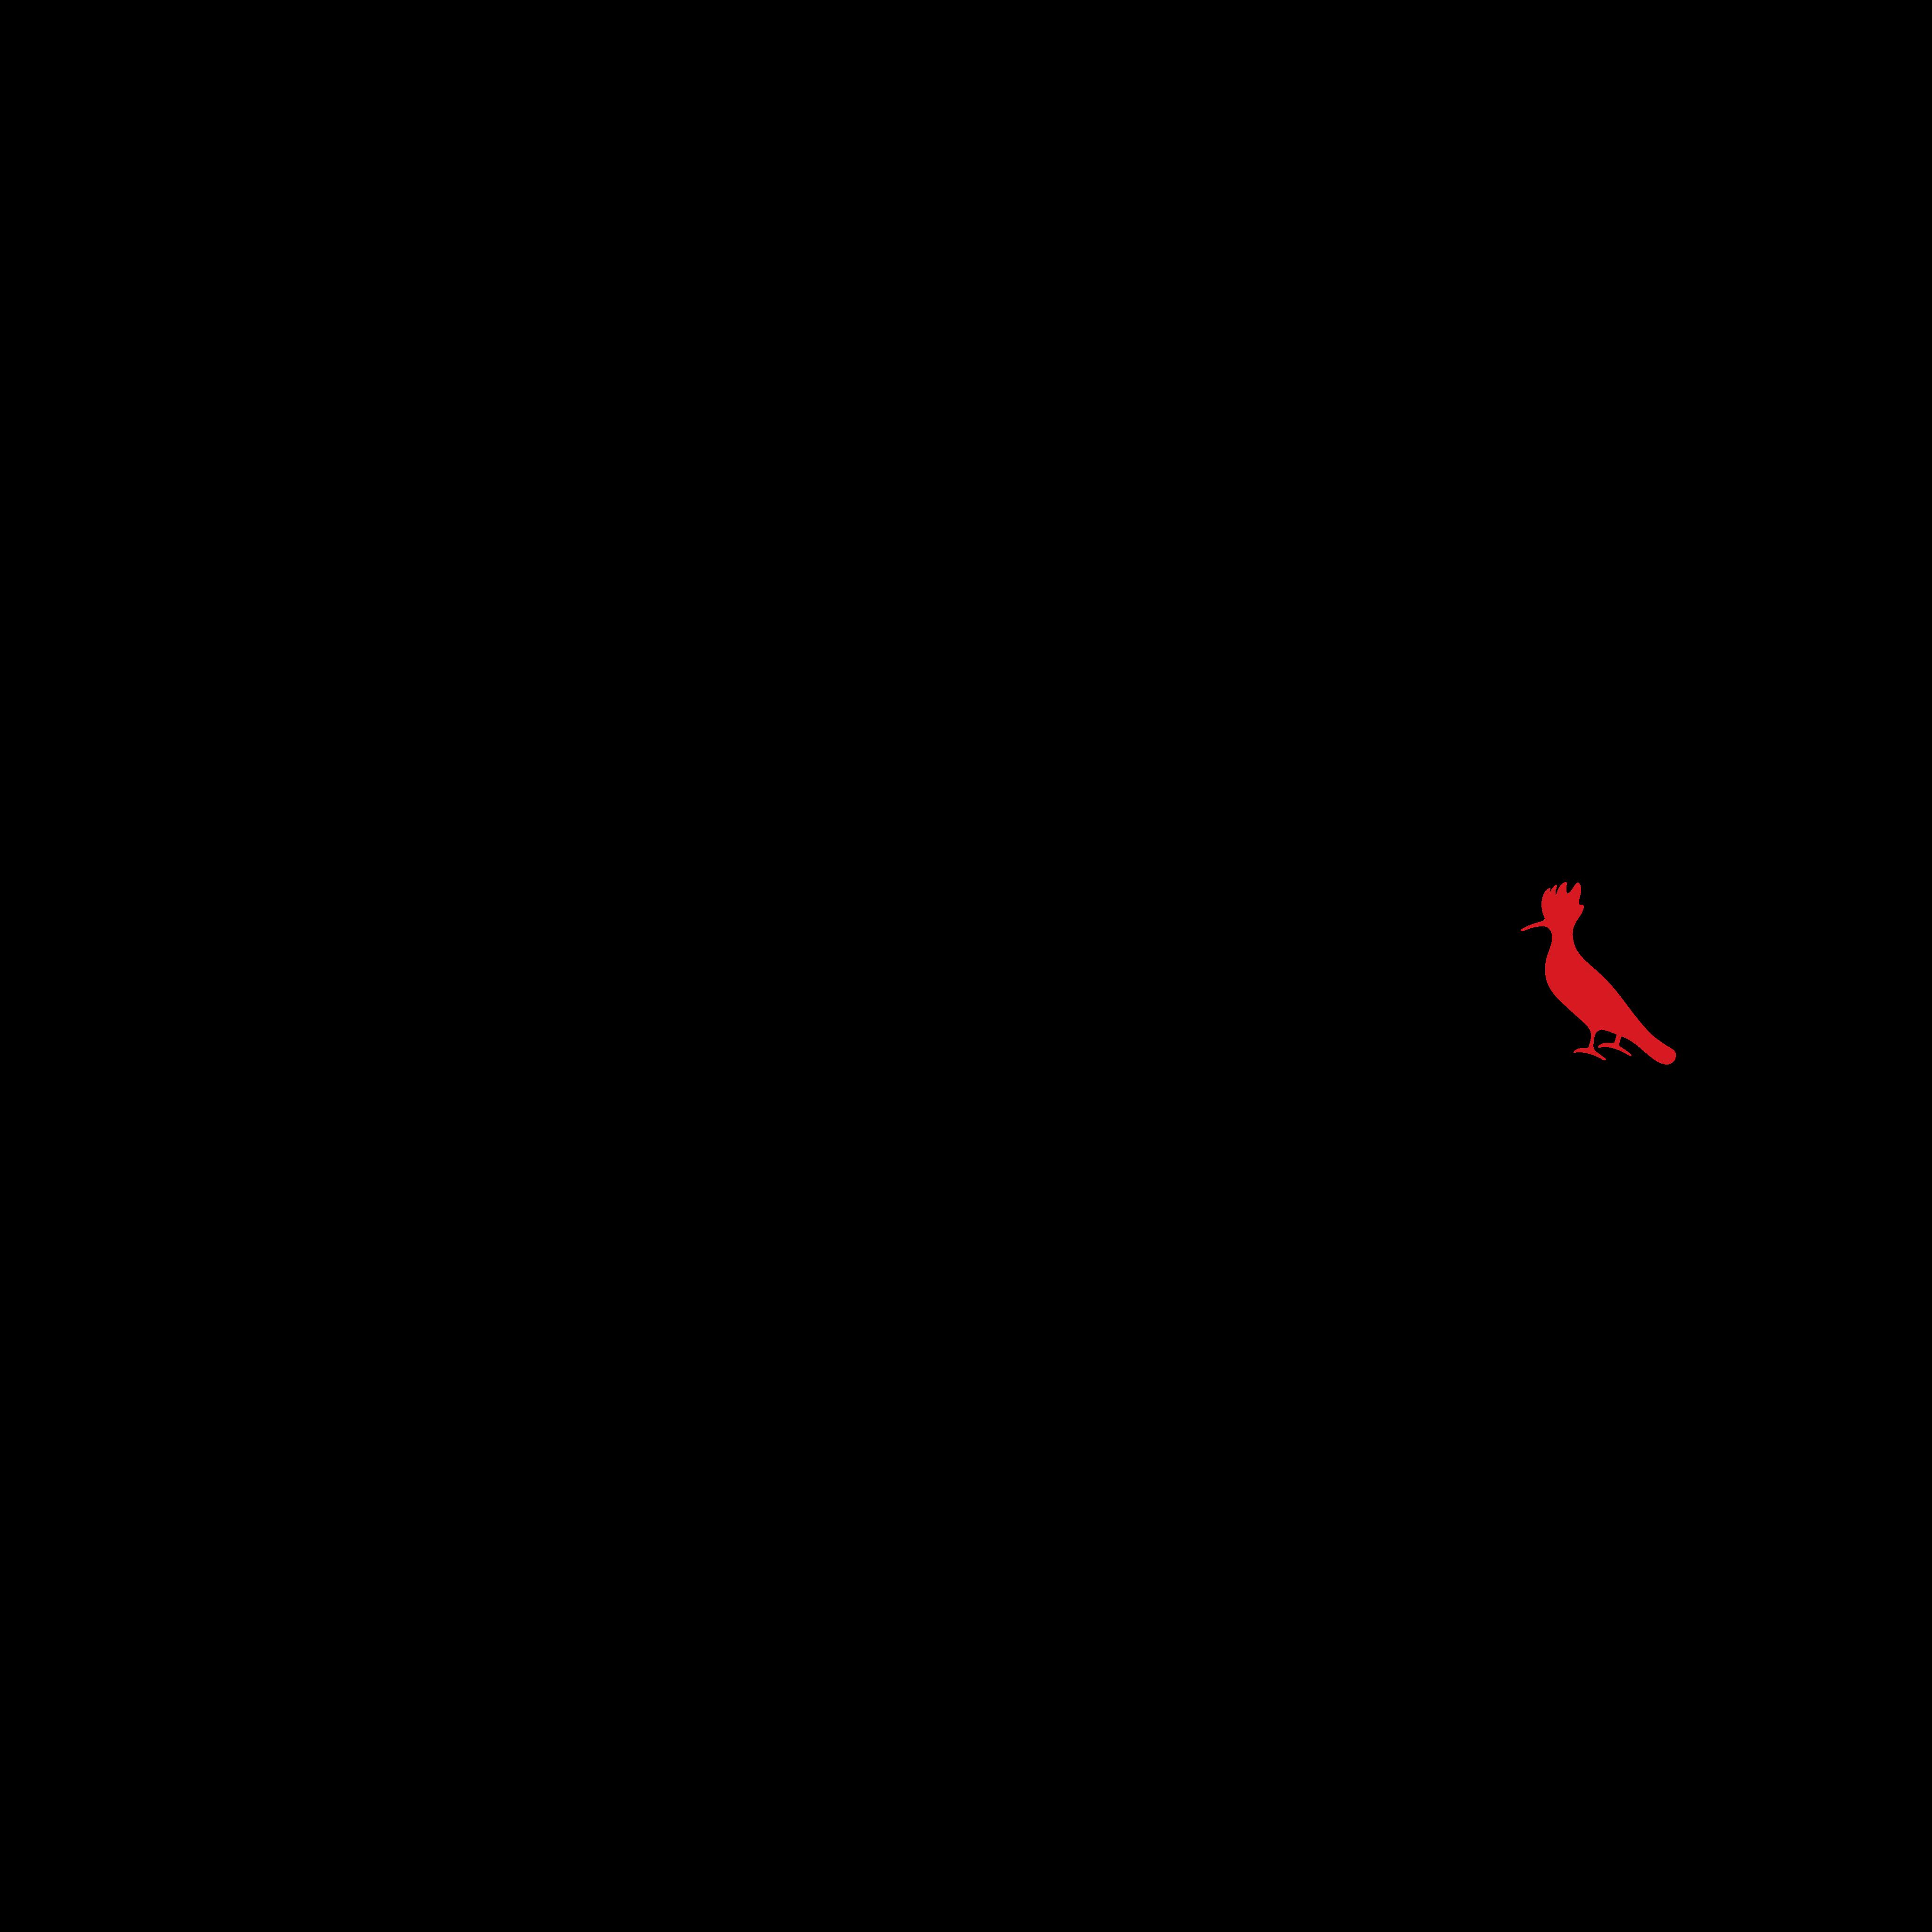 reserva logo 0 - Reserva Logo